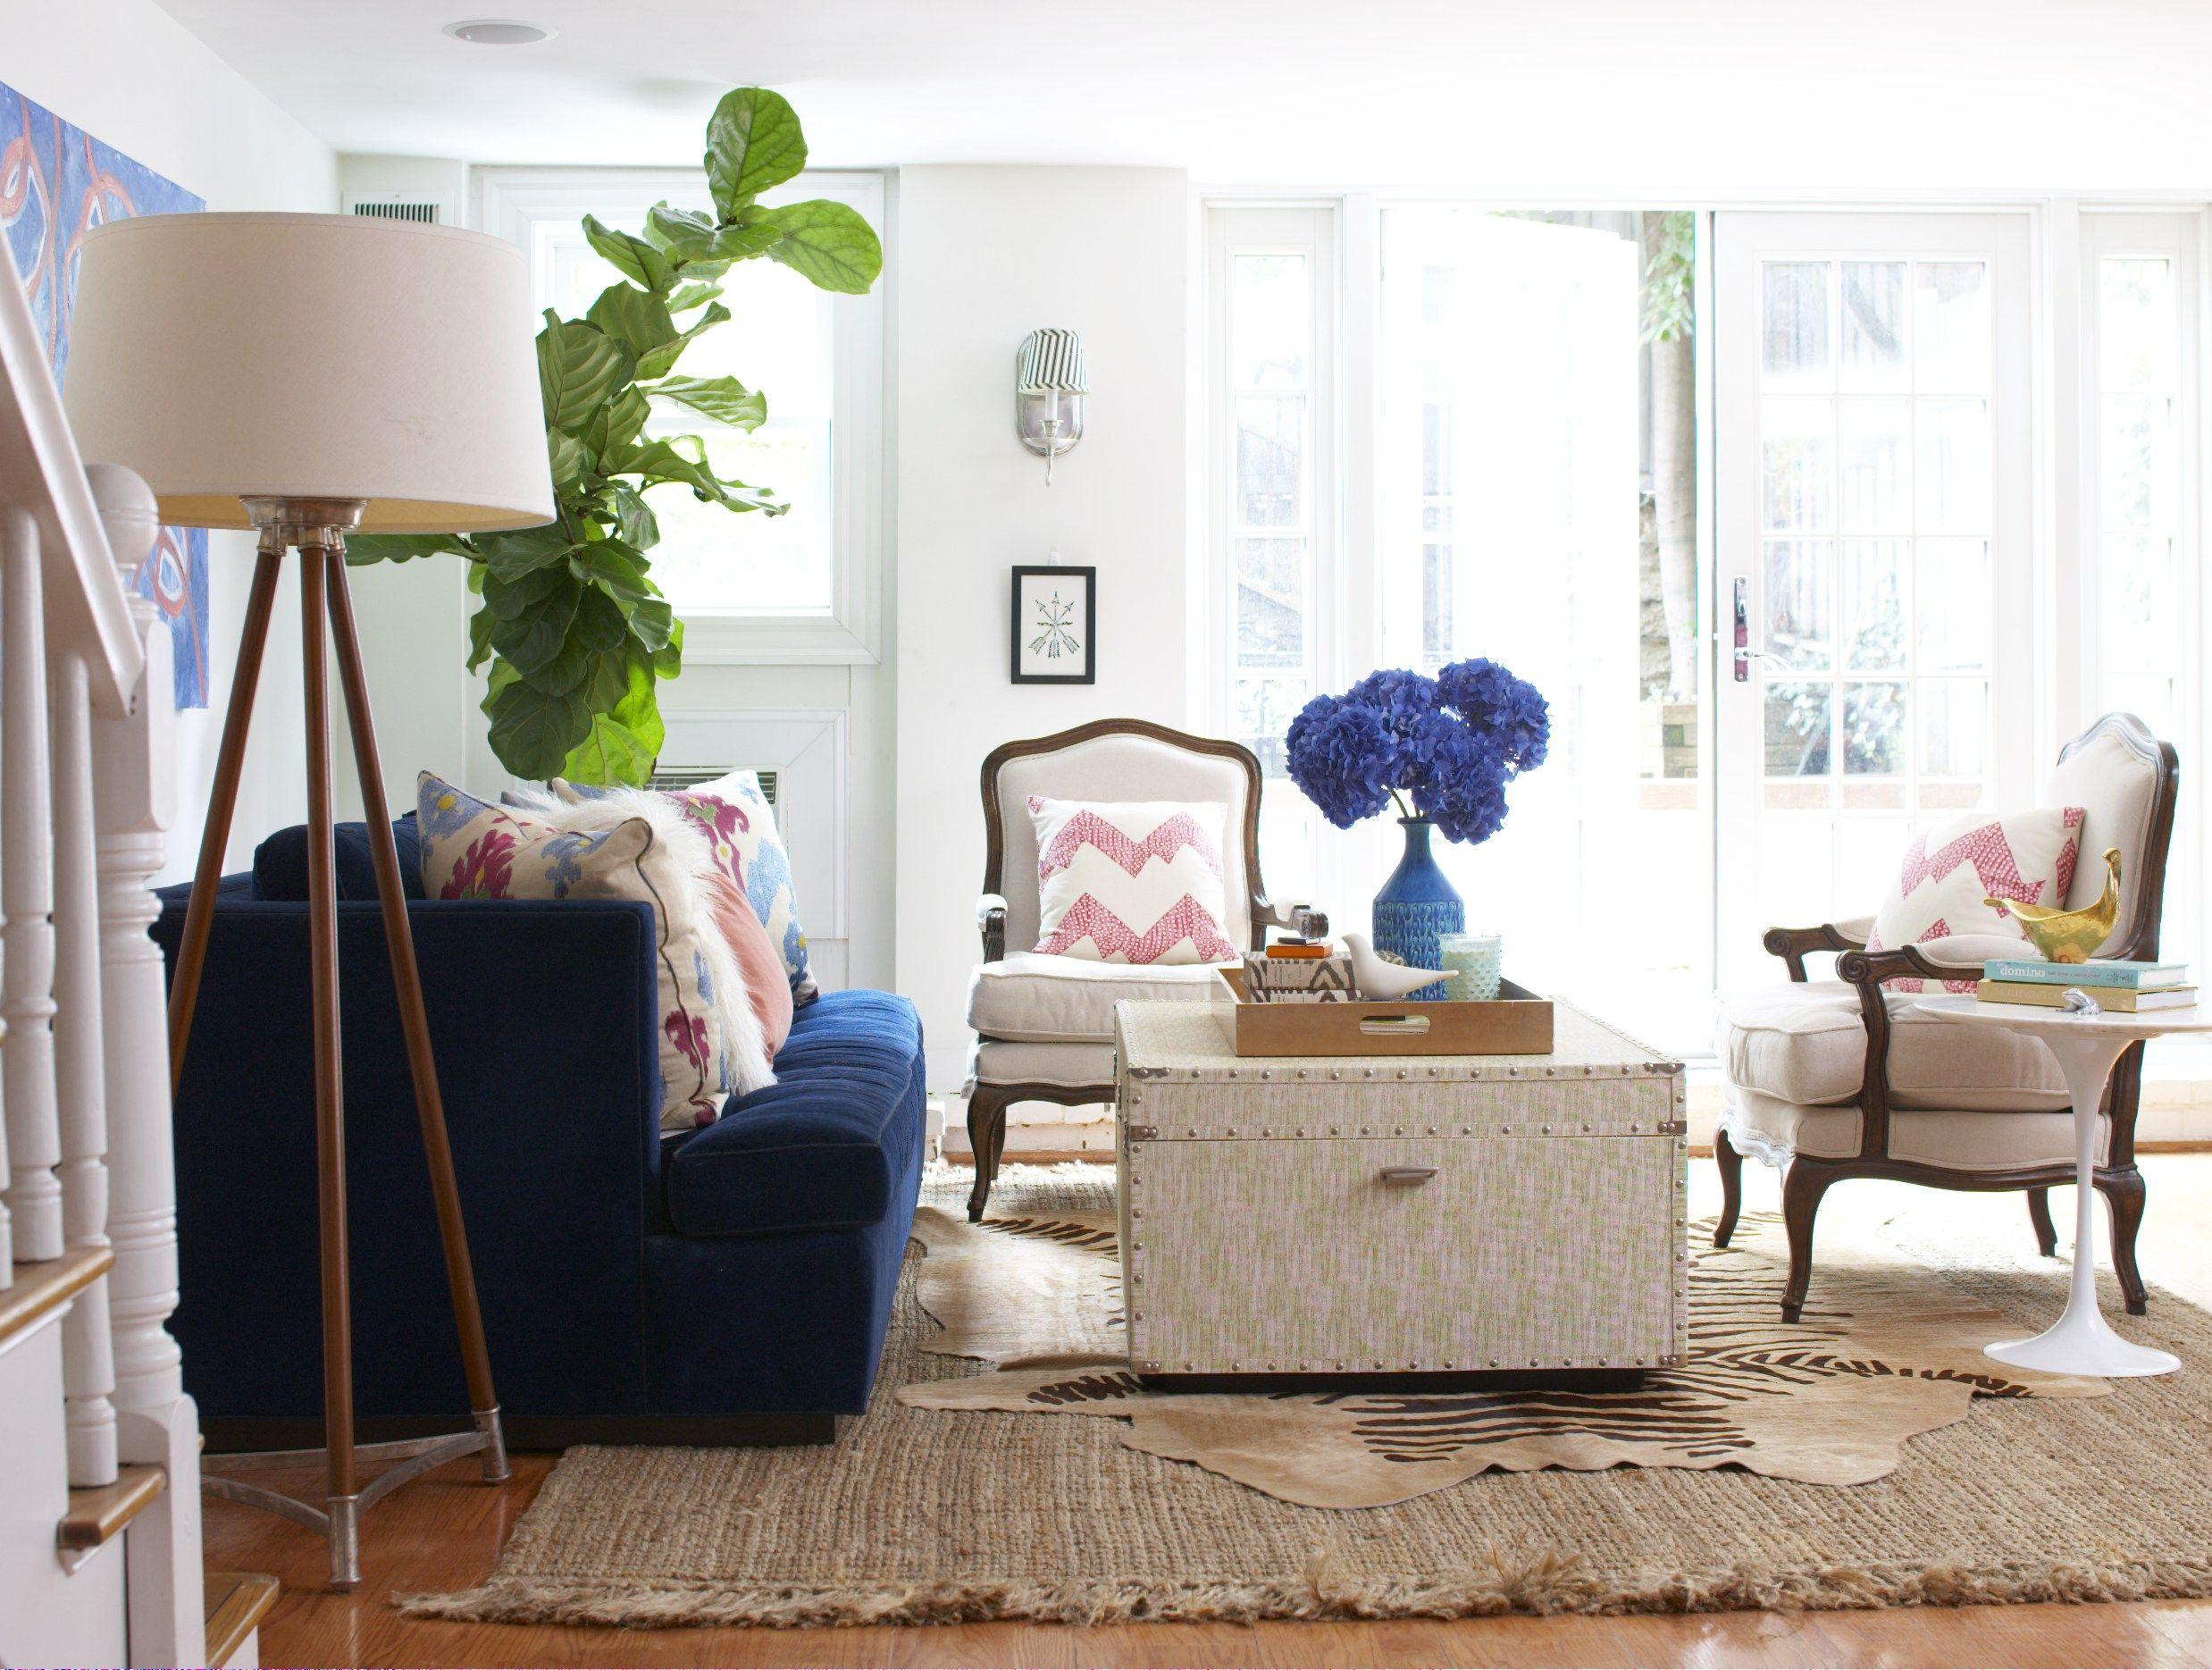 braided jute rug & louisa bergere chairsballard designs i via